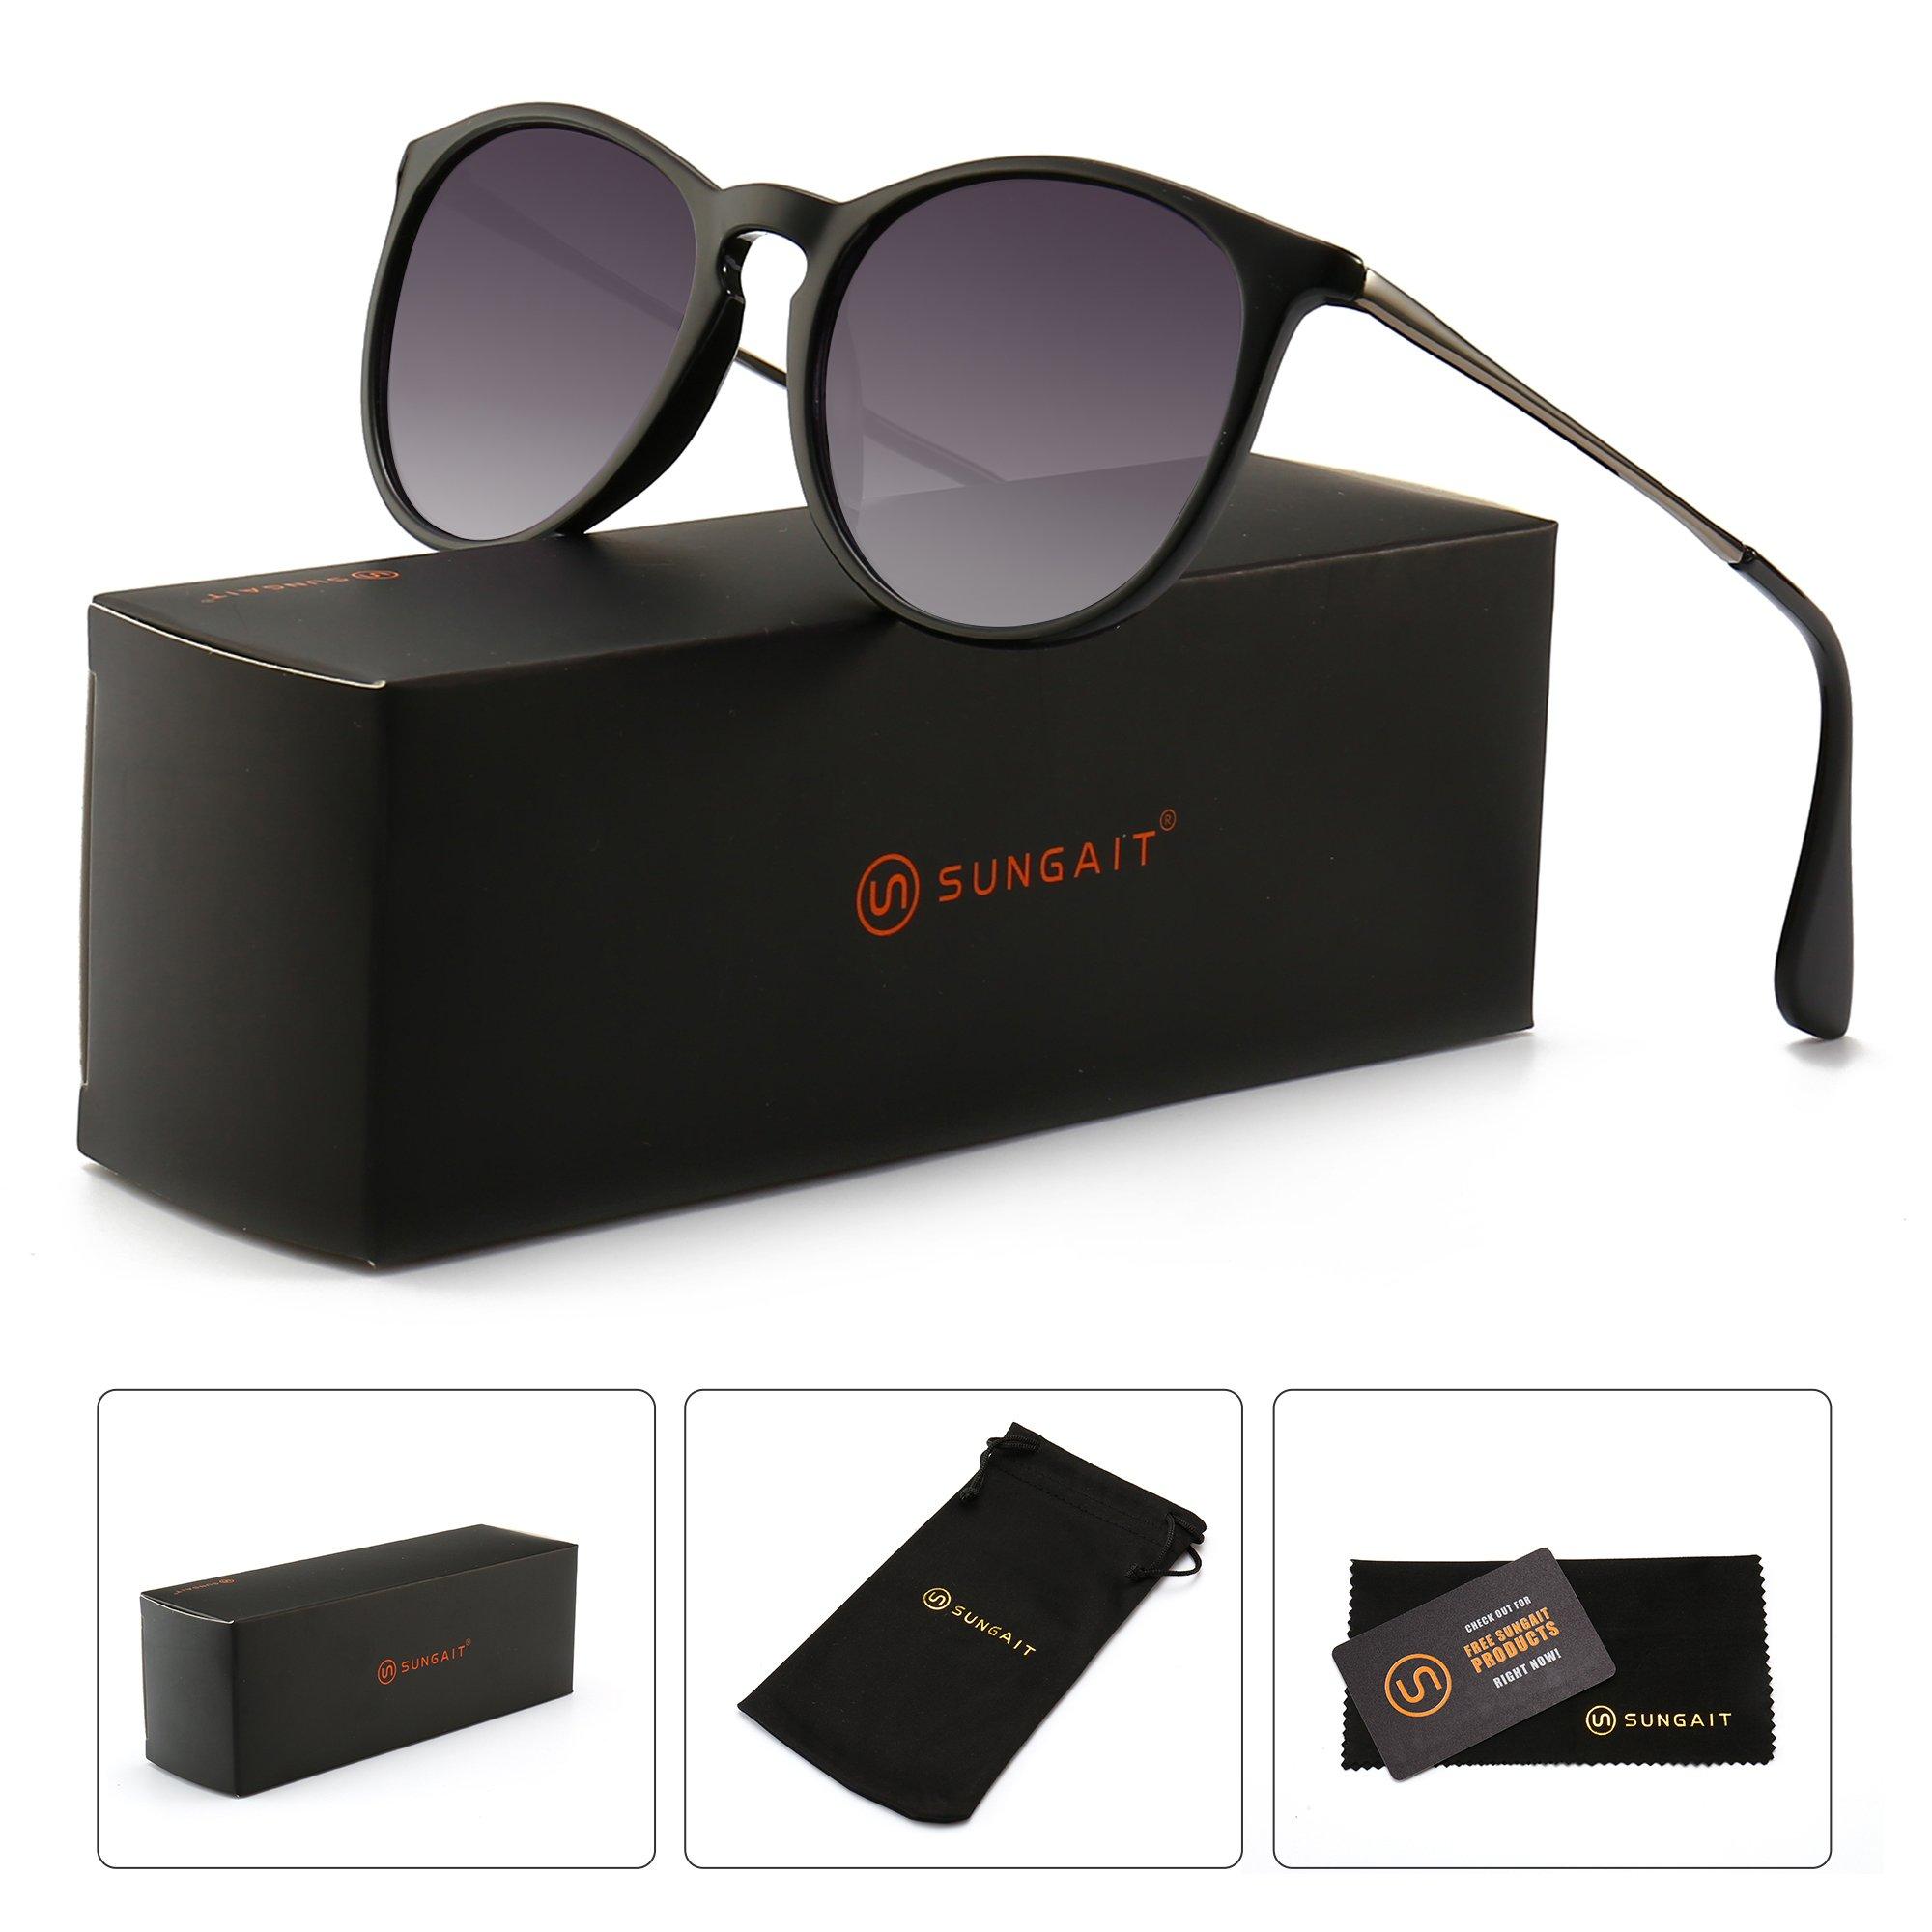 8344046dd4 SUNGAIT Vintage Round Sunglasses for Women Classic Retro Designer Style